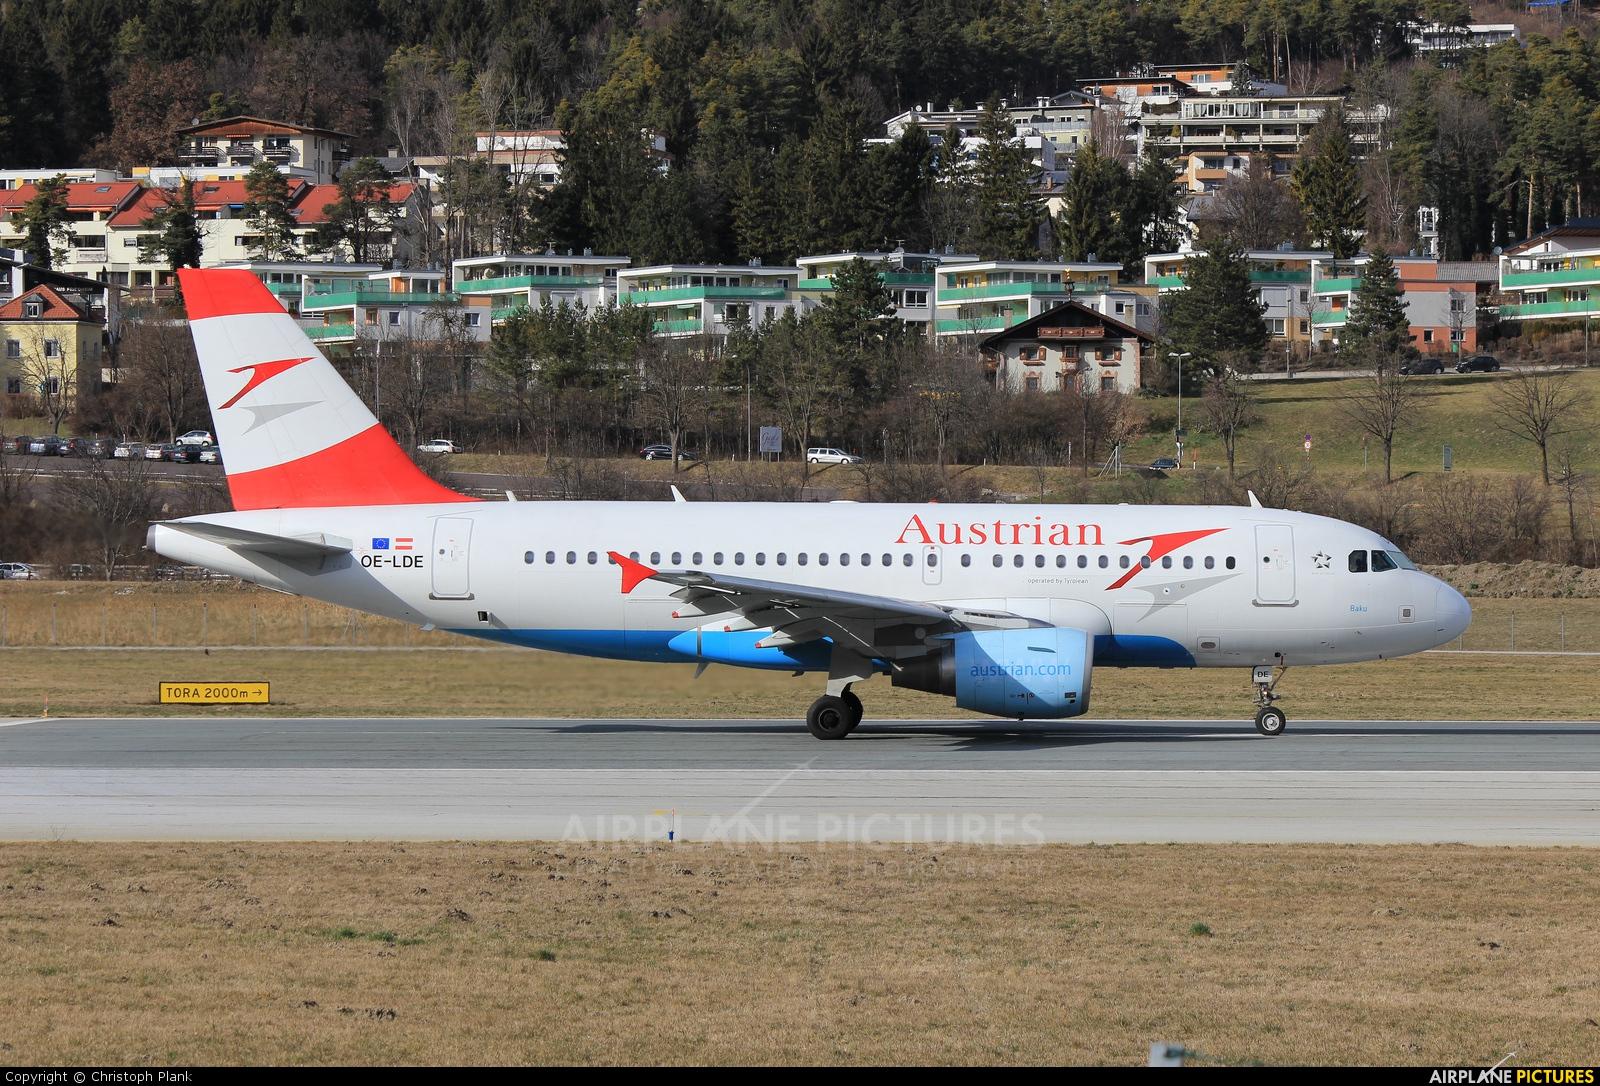 Austrian Airlines/Arrows/Tyrolean OE-LDE aircraft at Innsbruck